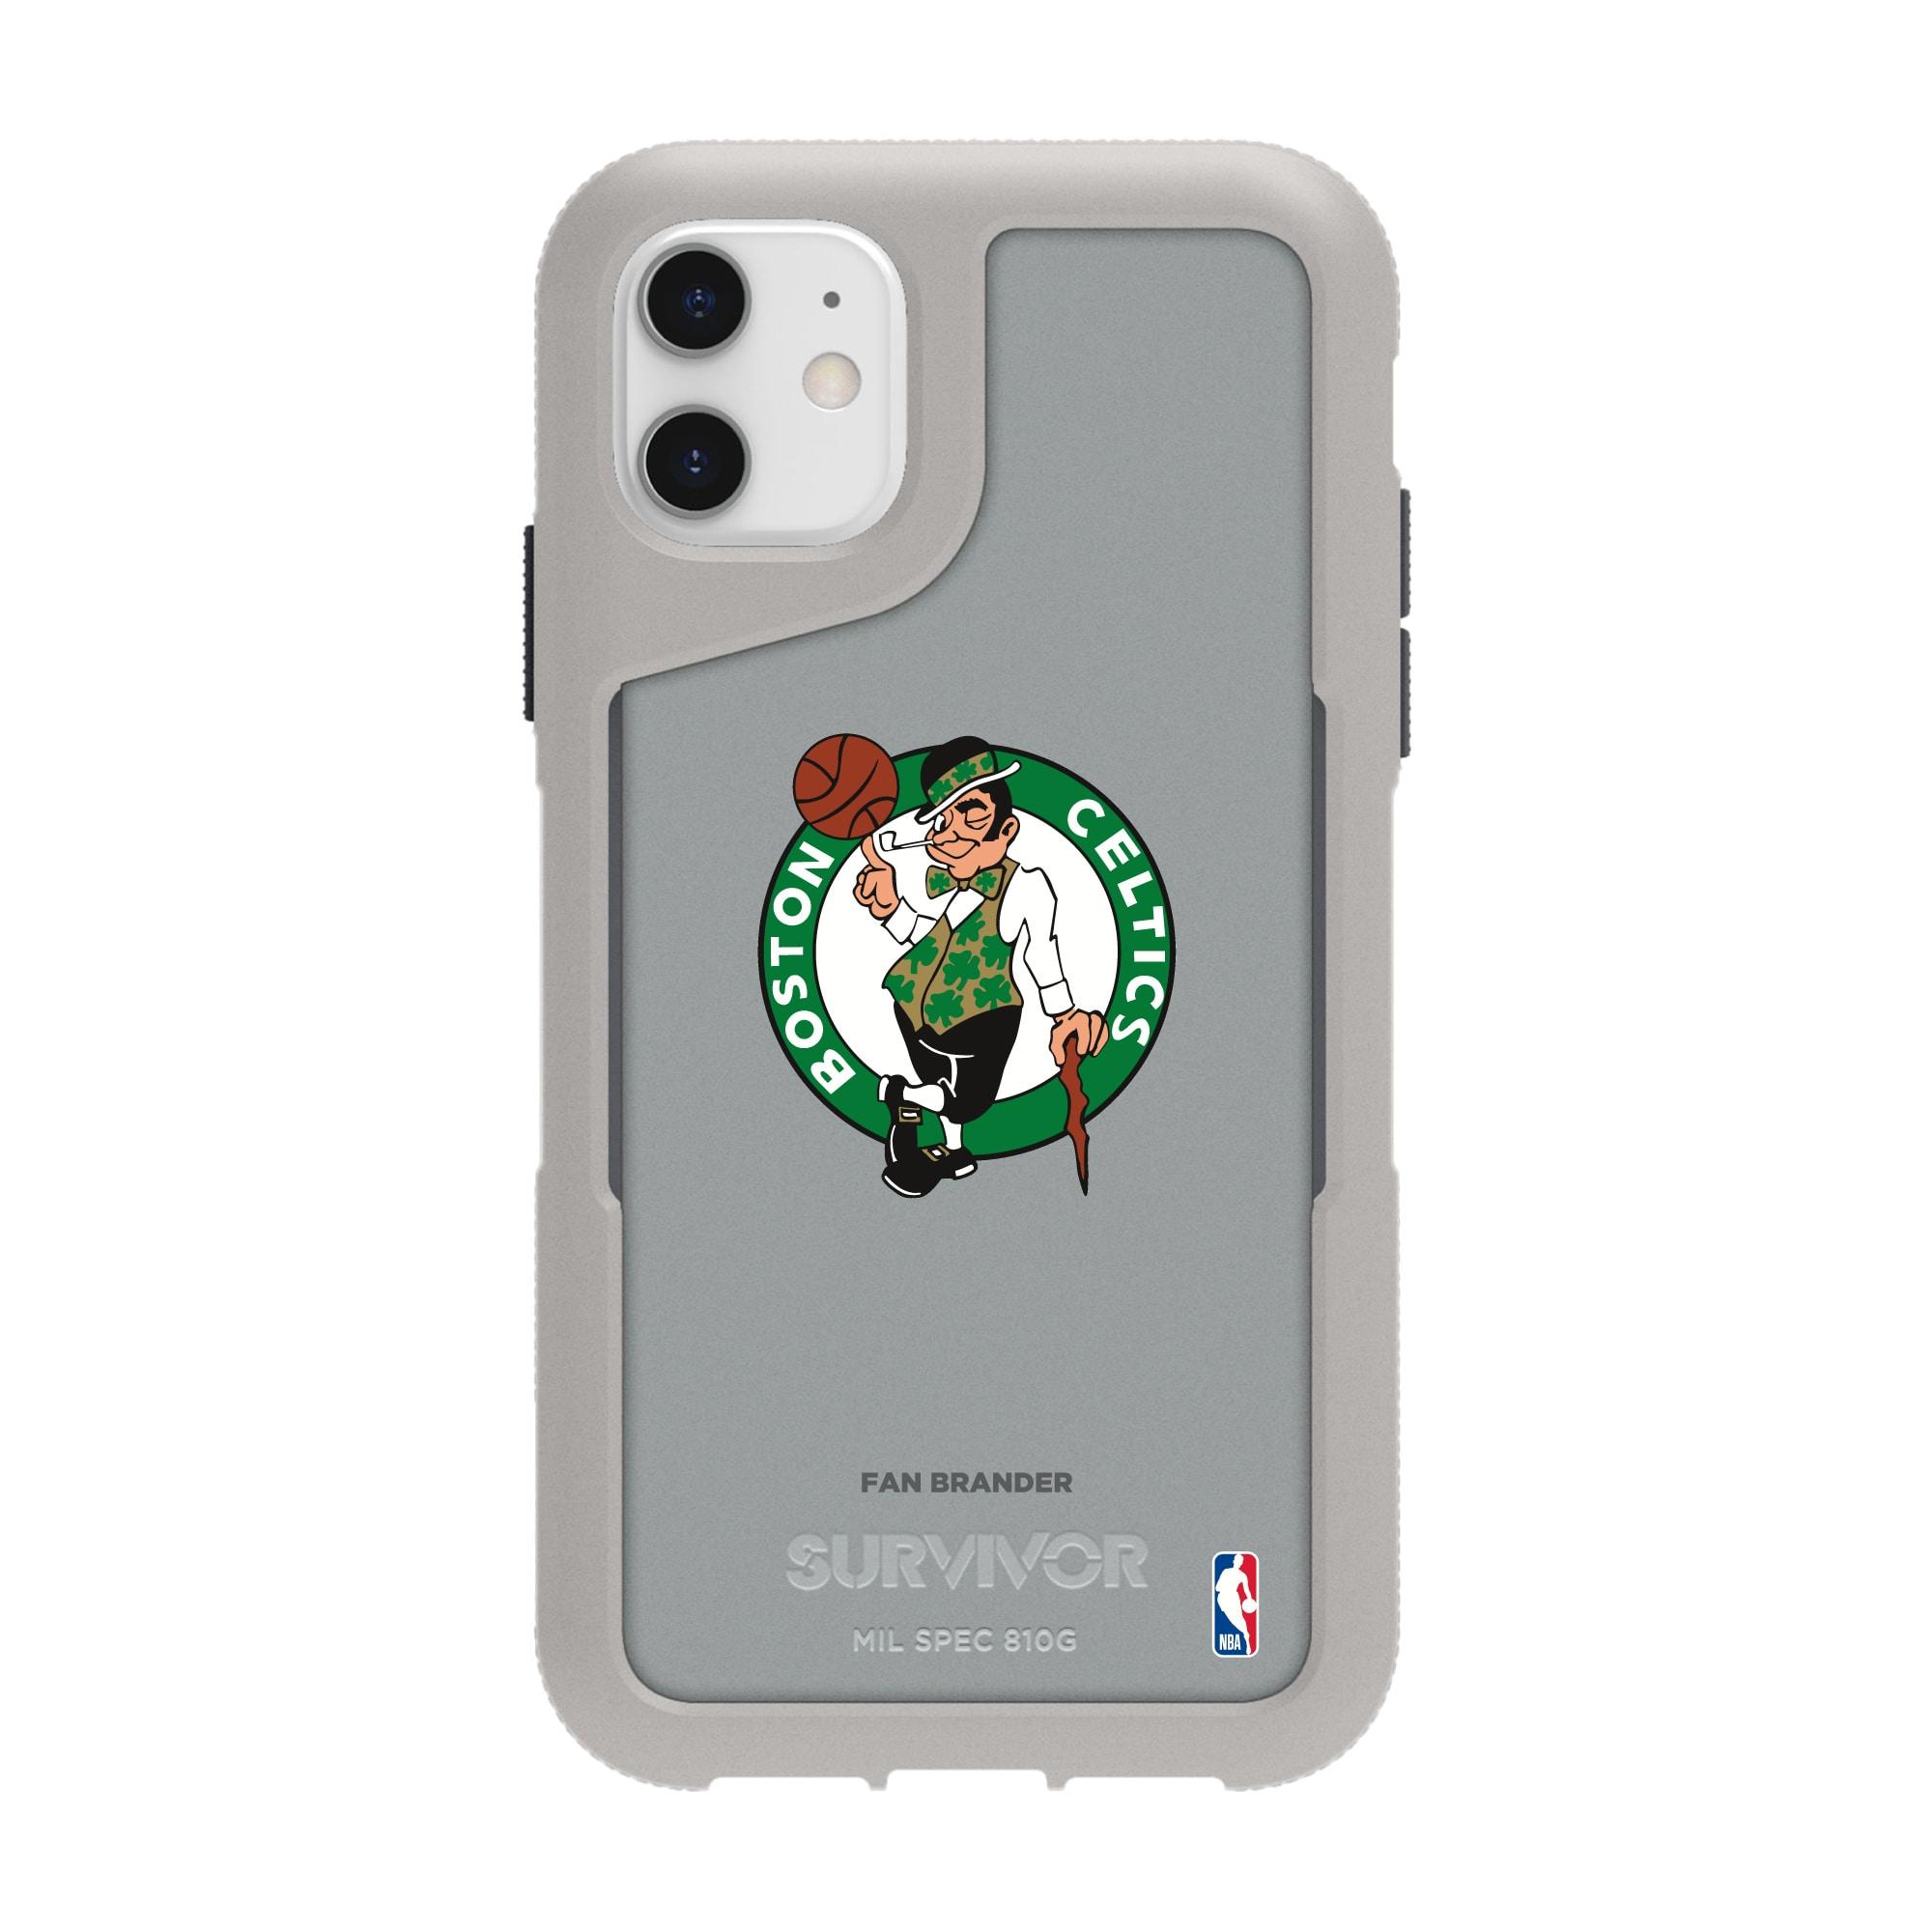 Boston Celtics Griffin Survivor Endurance iPhone Case - Gray